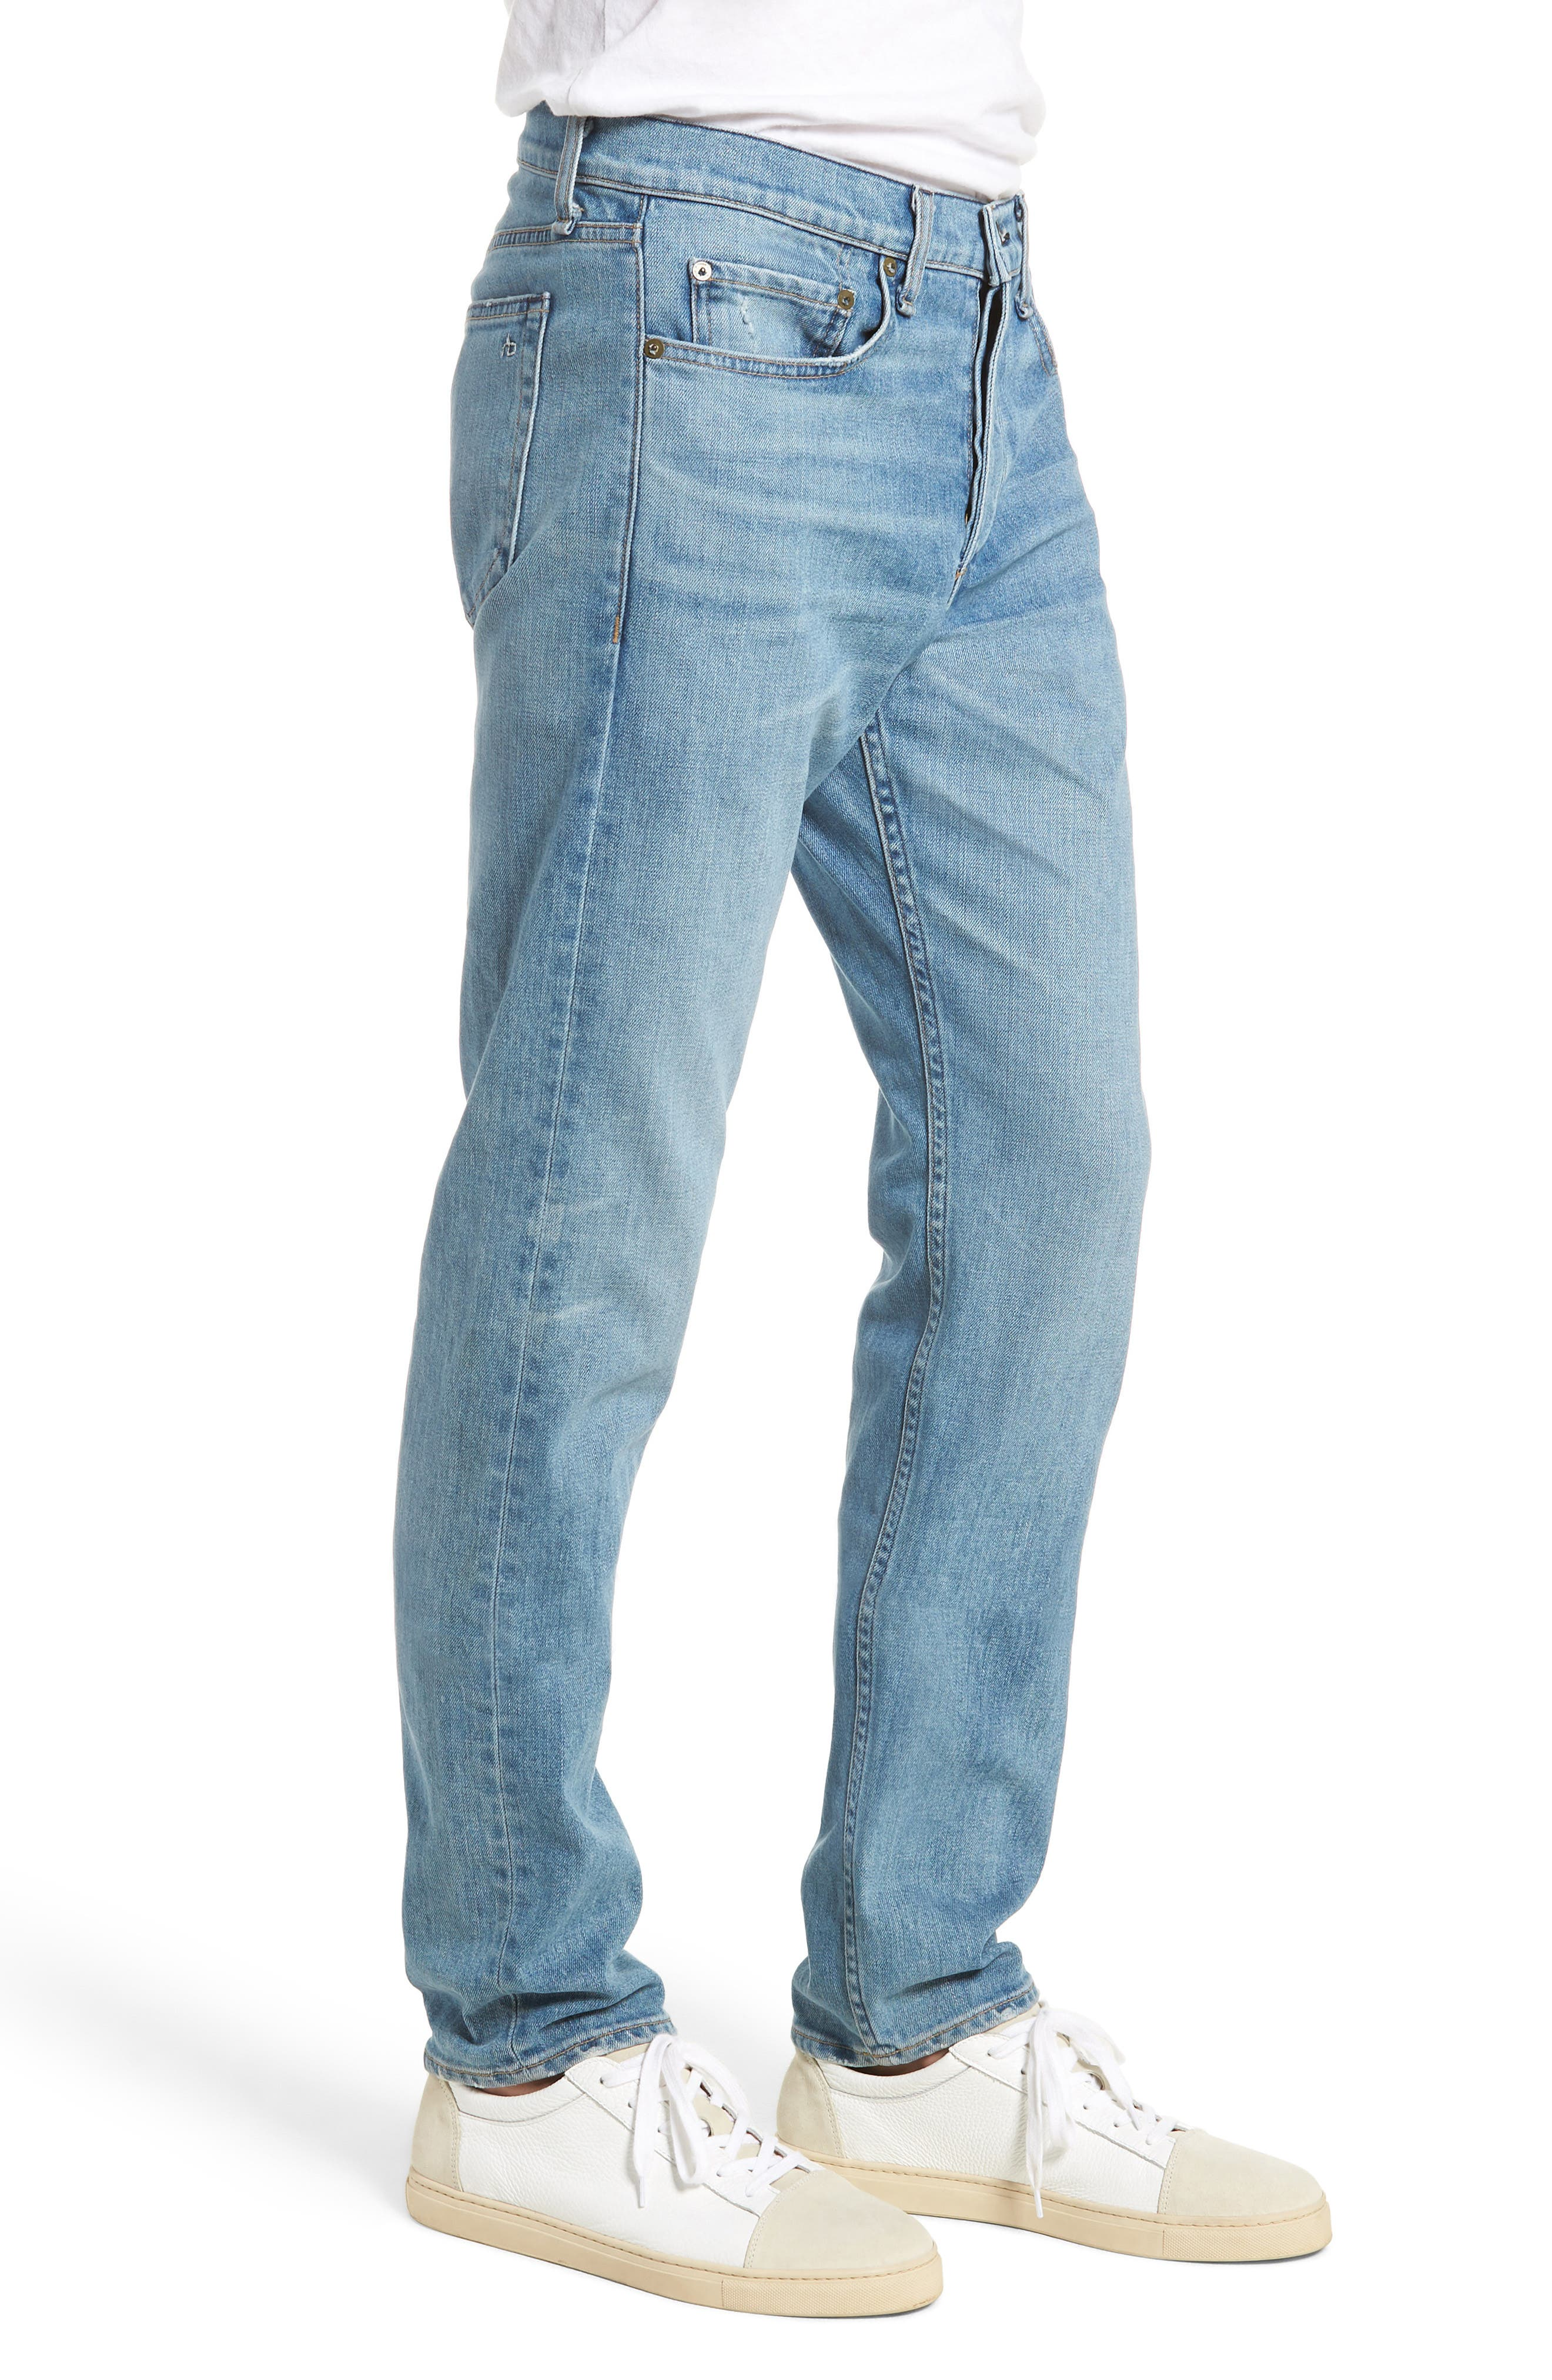 Fit 2 Slim Fit Jeans,                             Alternate thumbnail 3, color,                             PYLLE